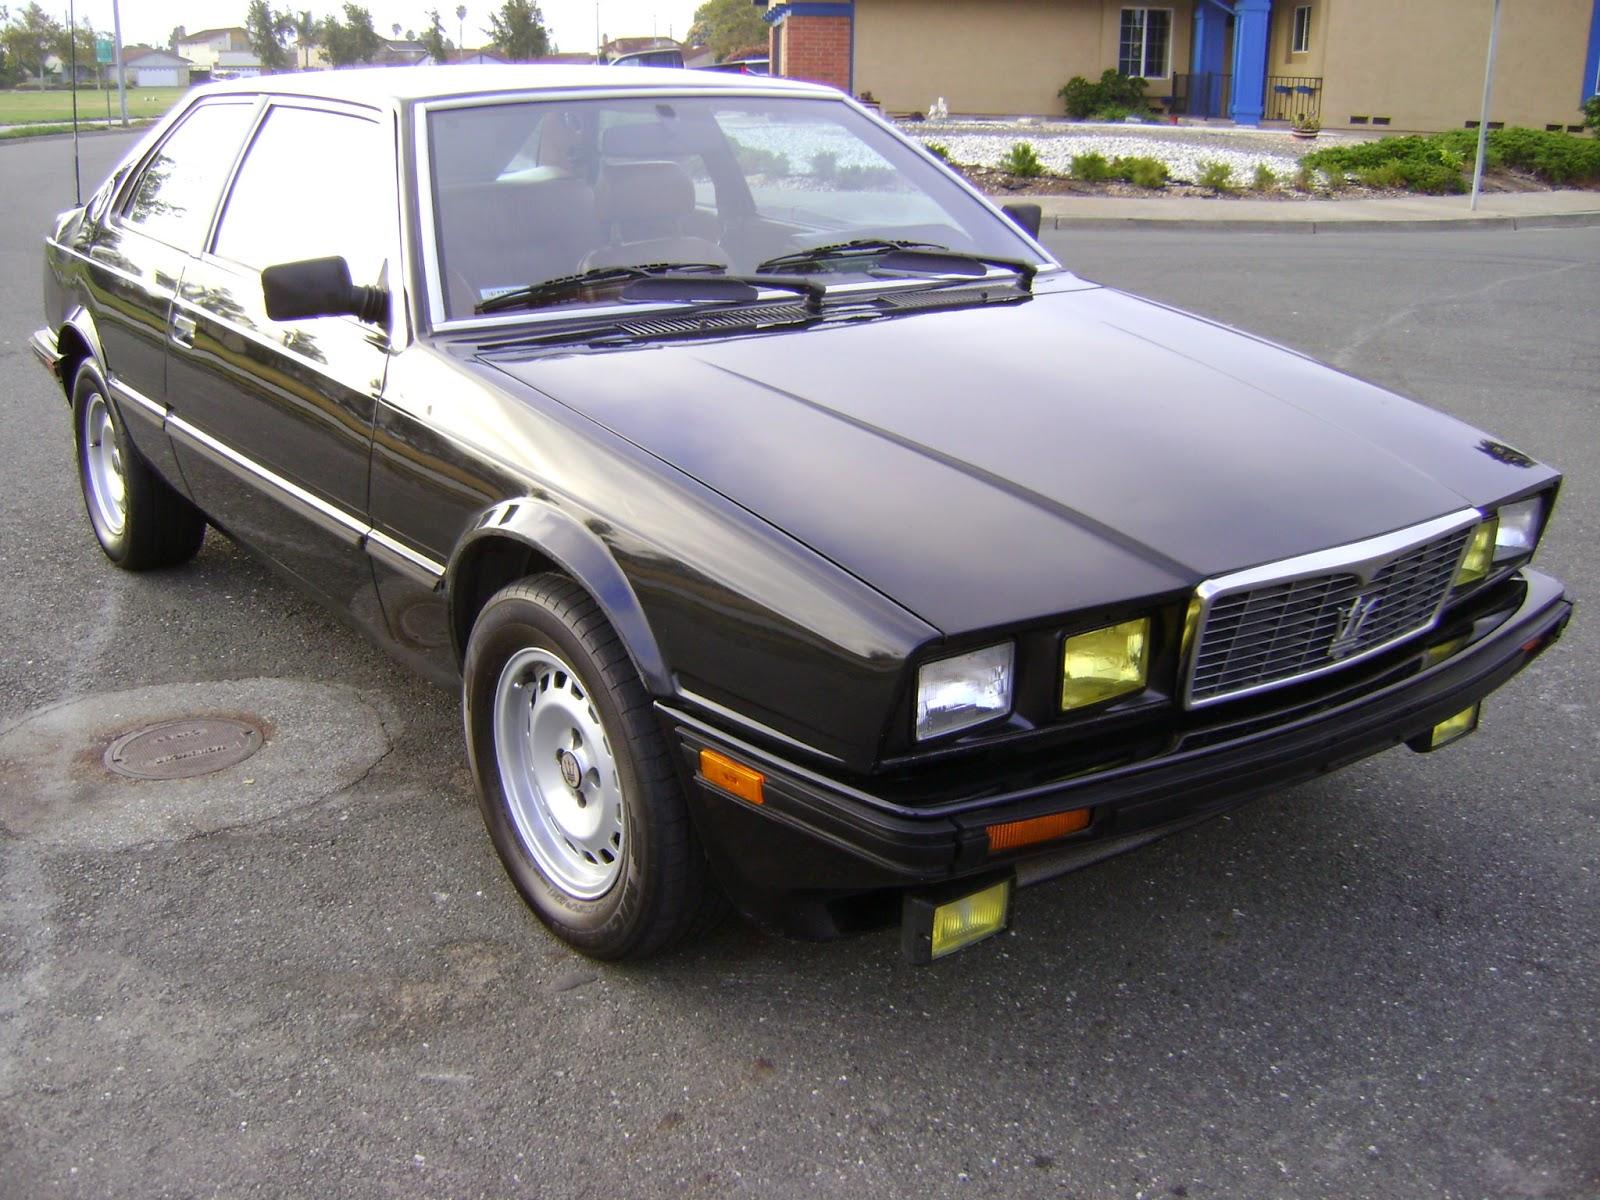 Daily Turismo: 3k: Don't Mase Me Bro: 1984 Maserati Biturbo Coupe 5 Spd